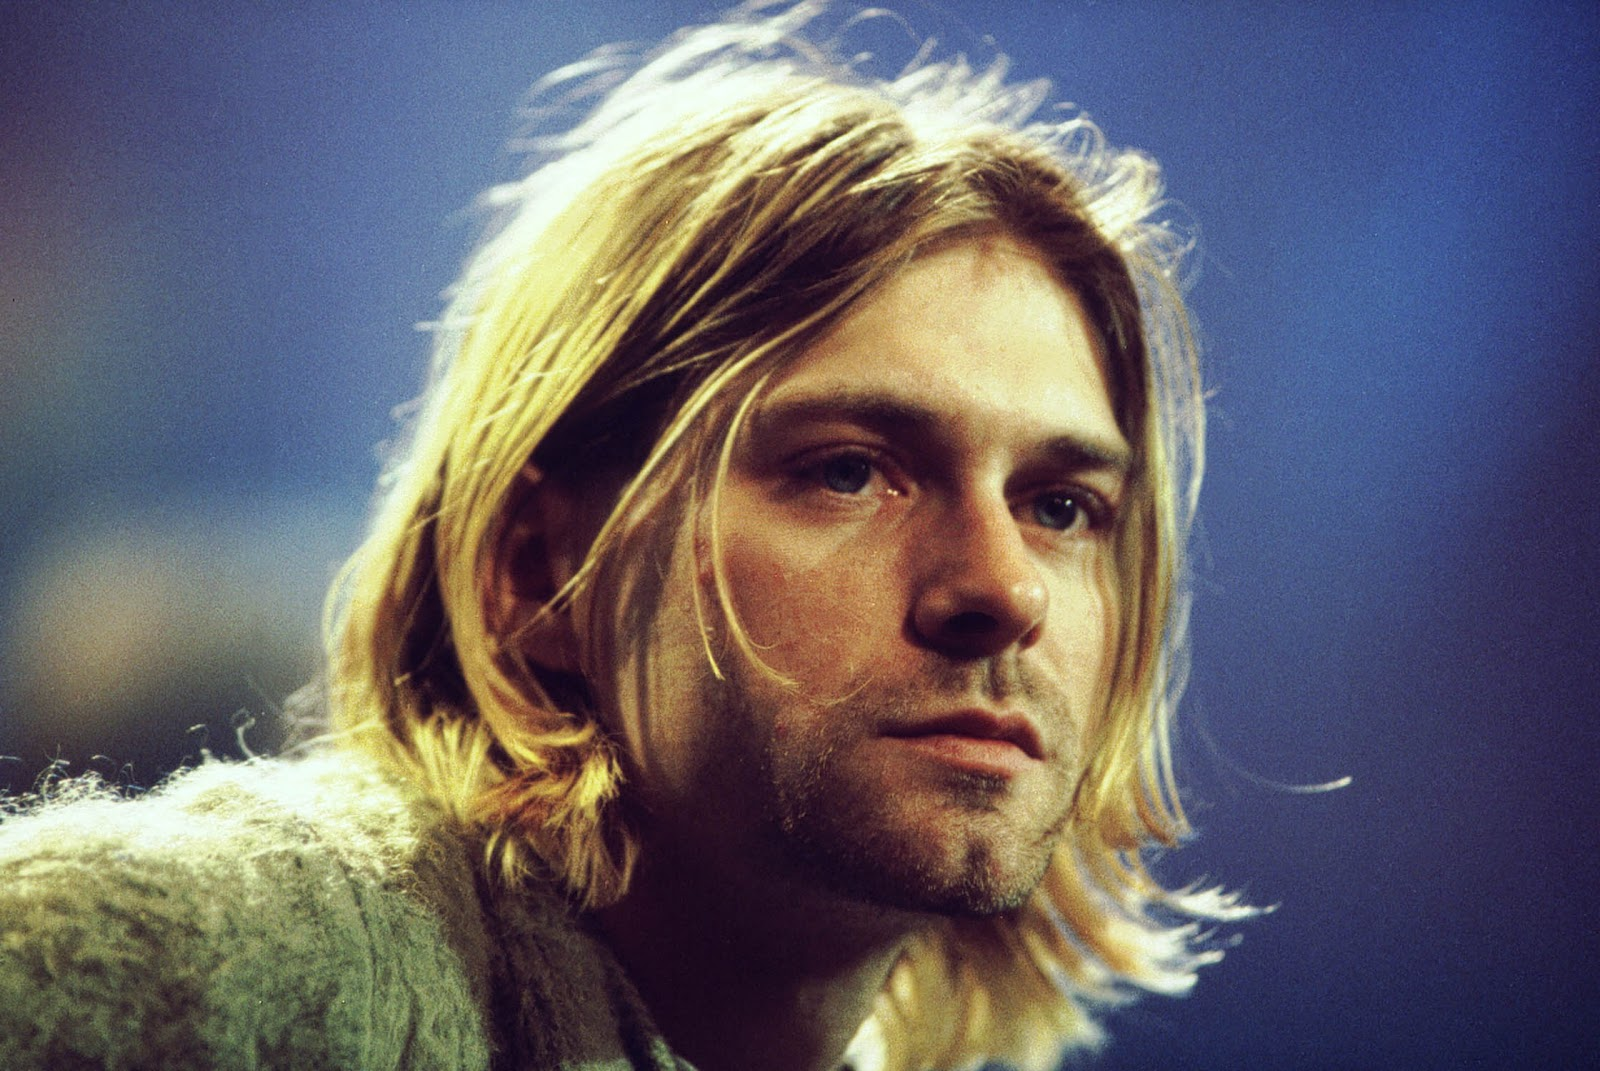 The Beat: Kurt Cobain's solo album